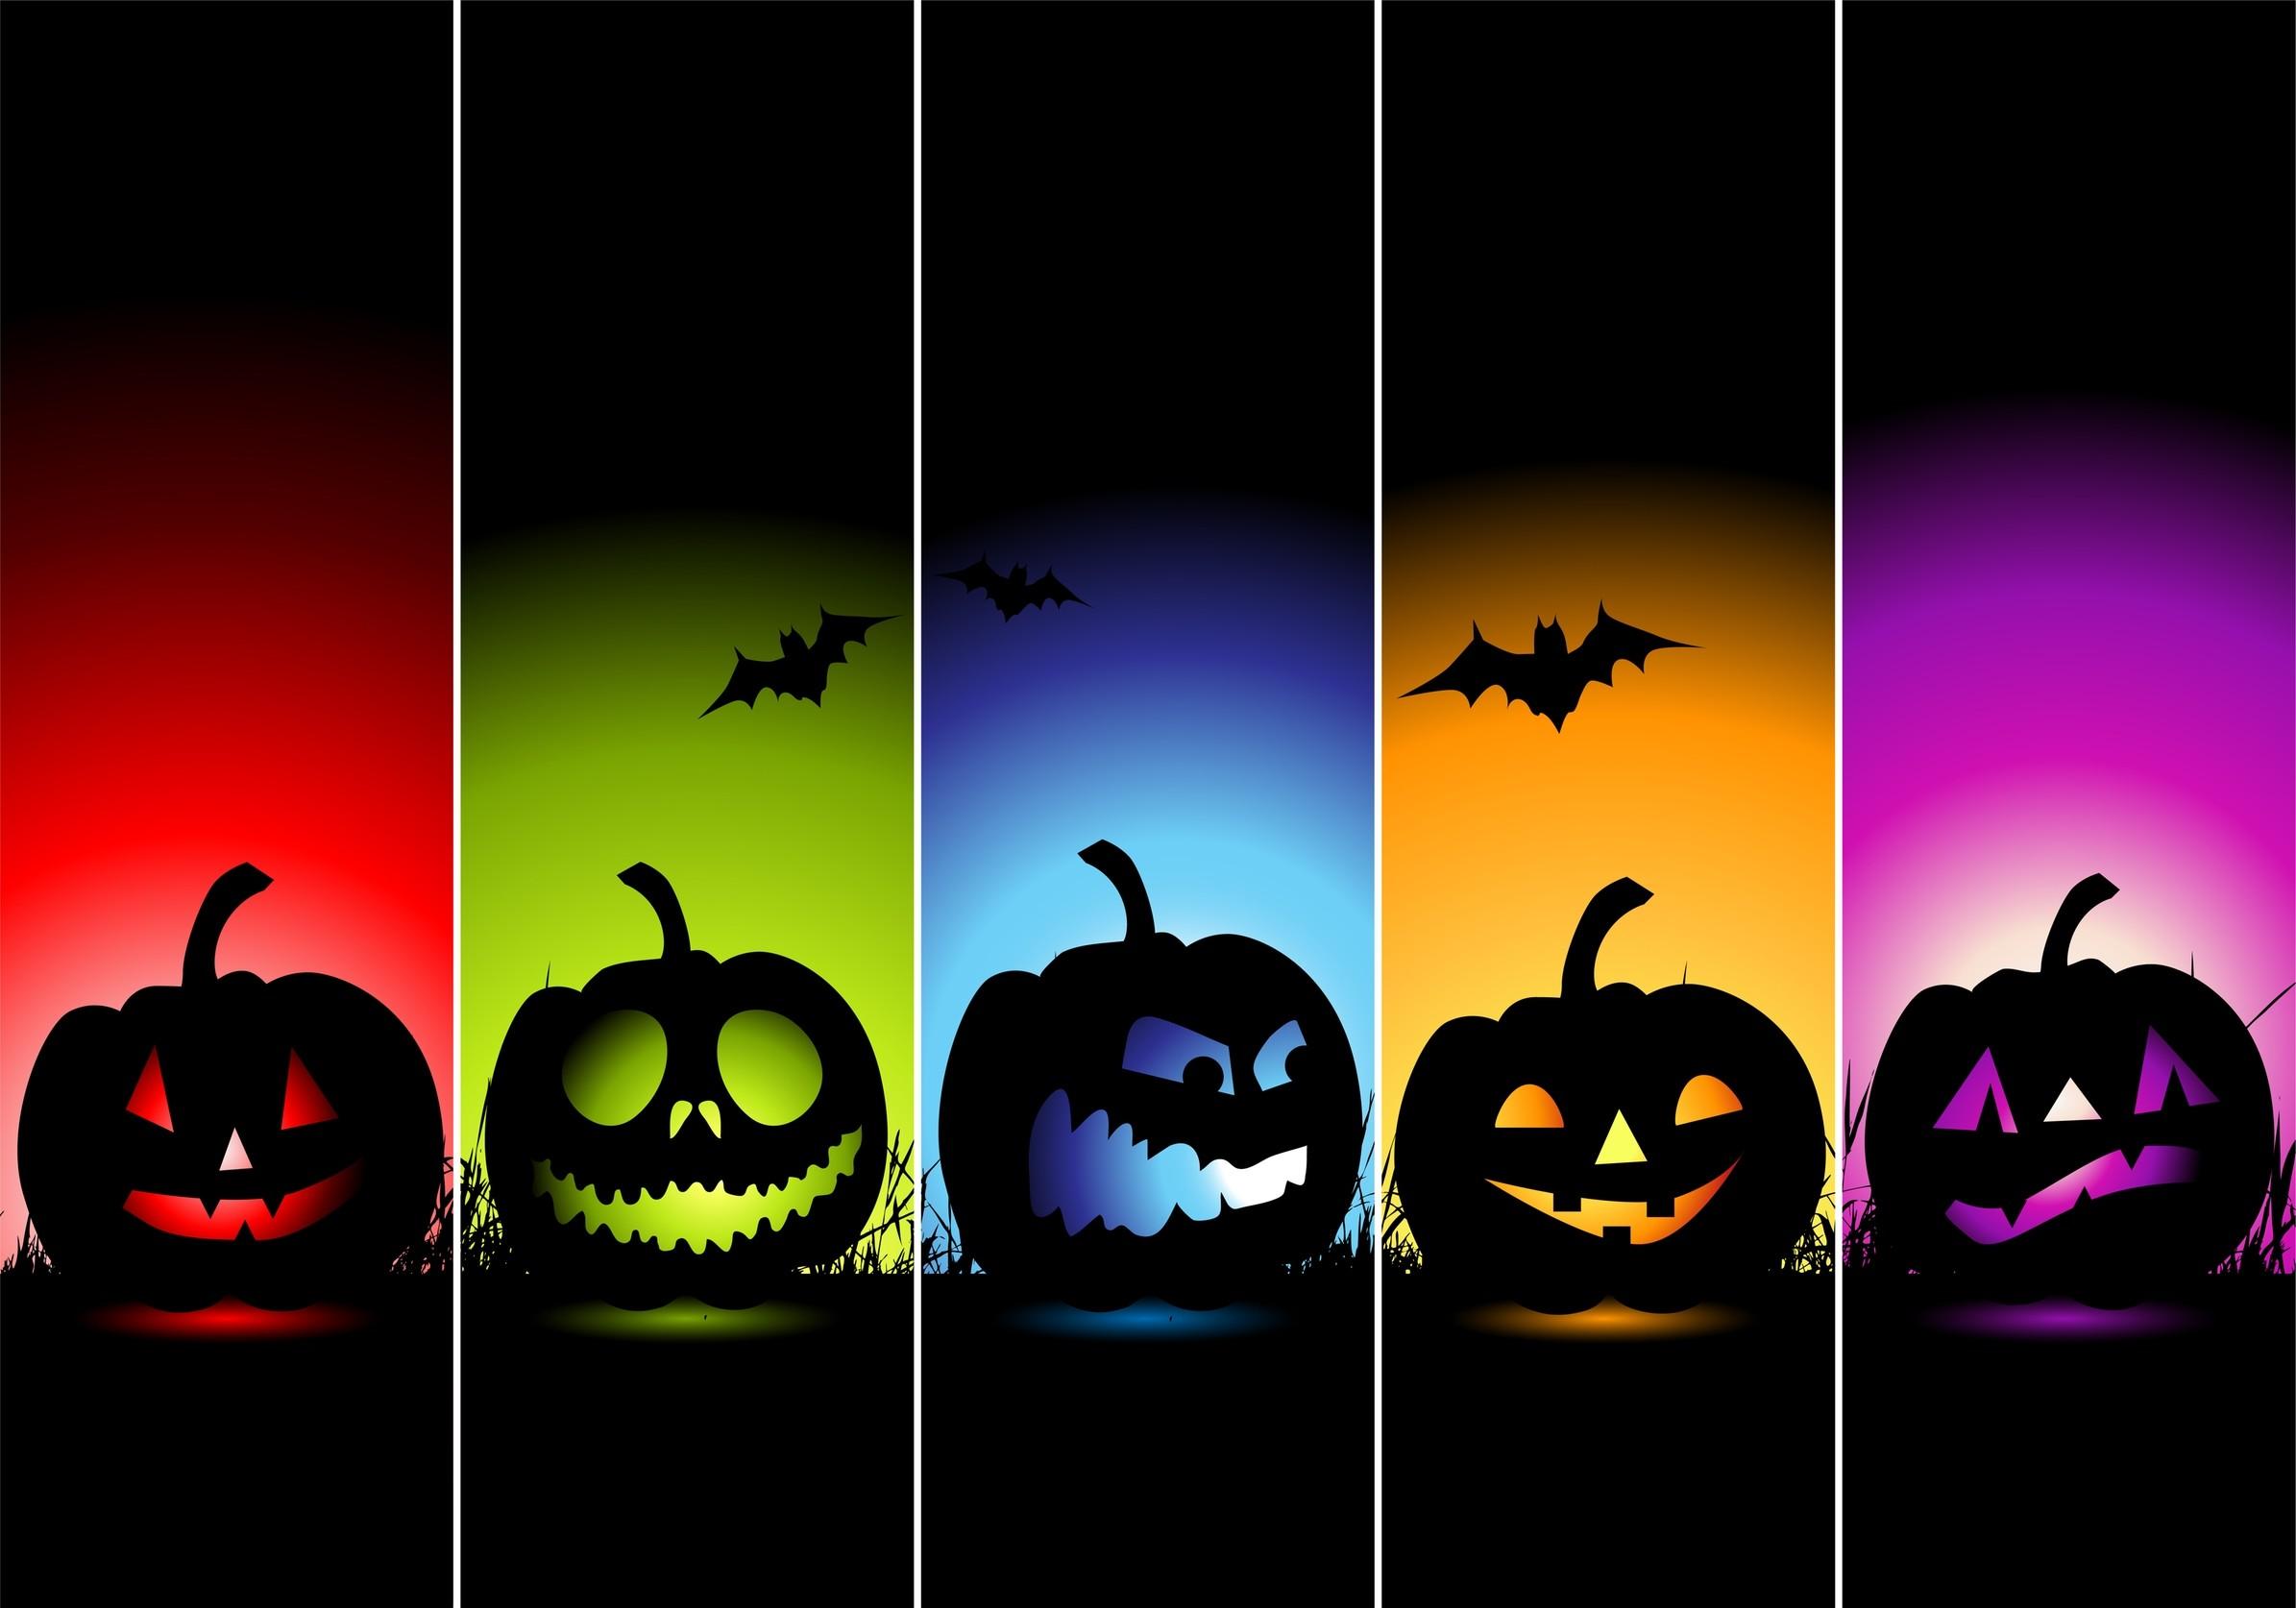 Cute Halloween Wallpaper Backgrounds 69 images